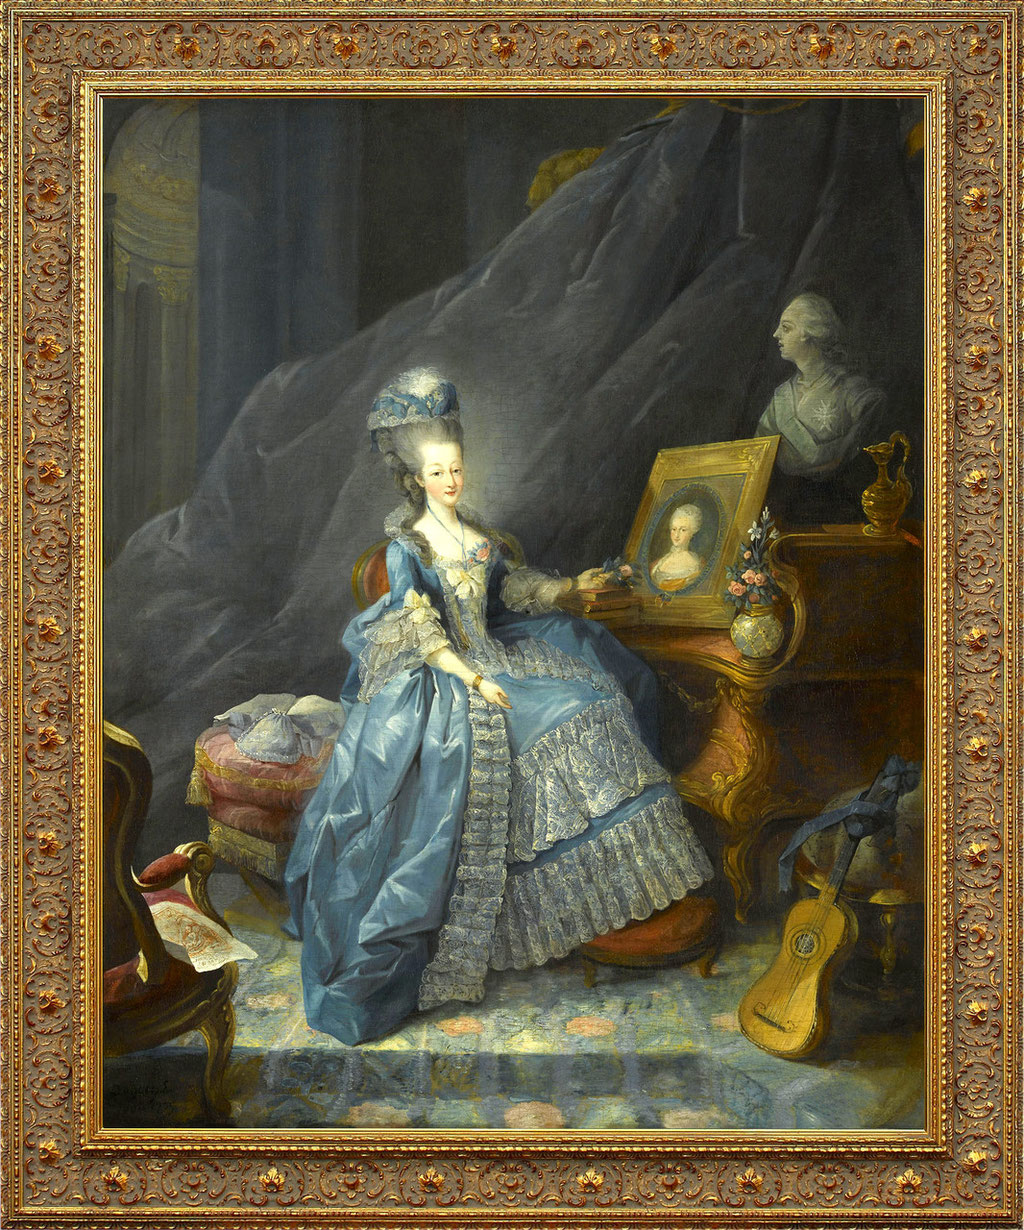 Dagoty, Marie Therese de Savoie